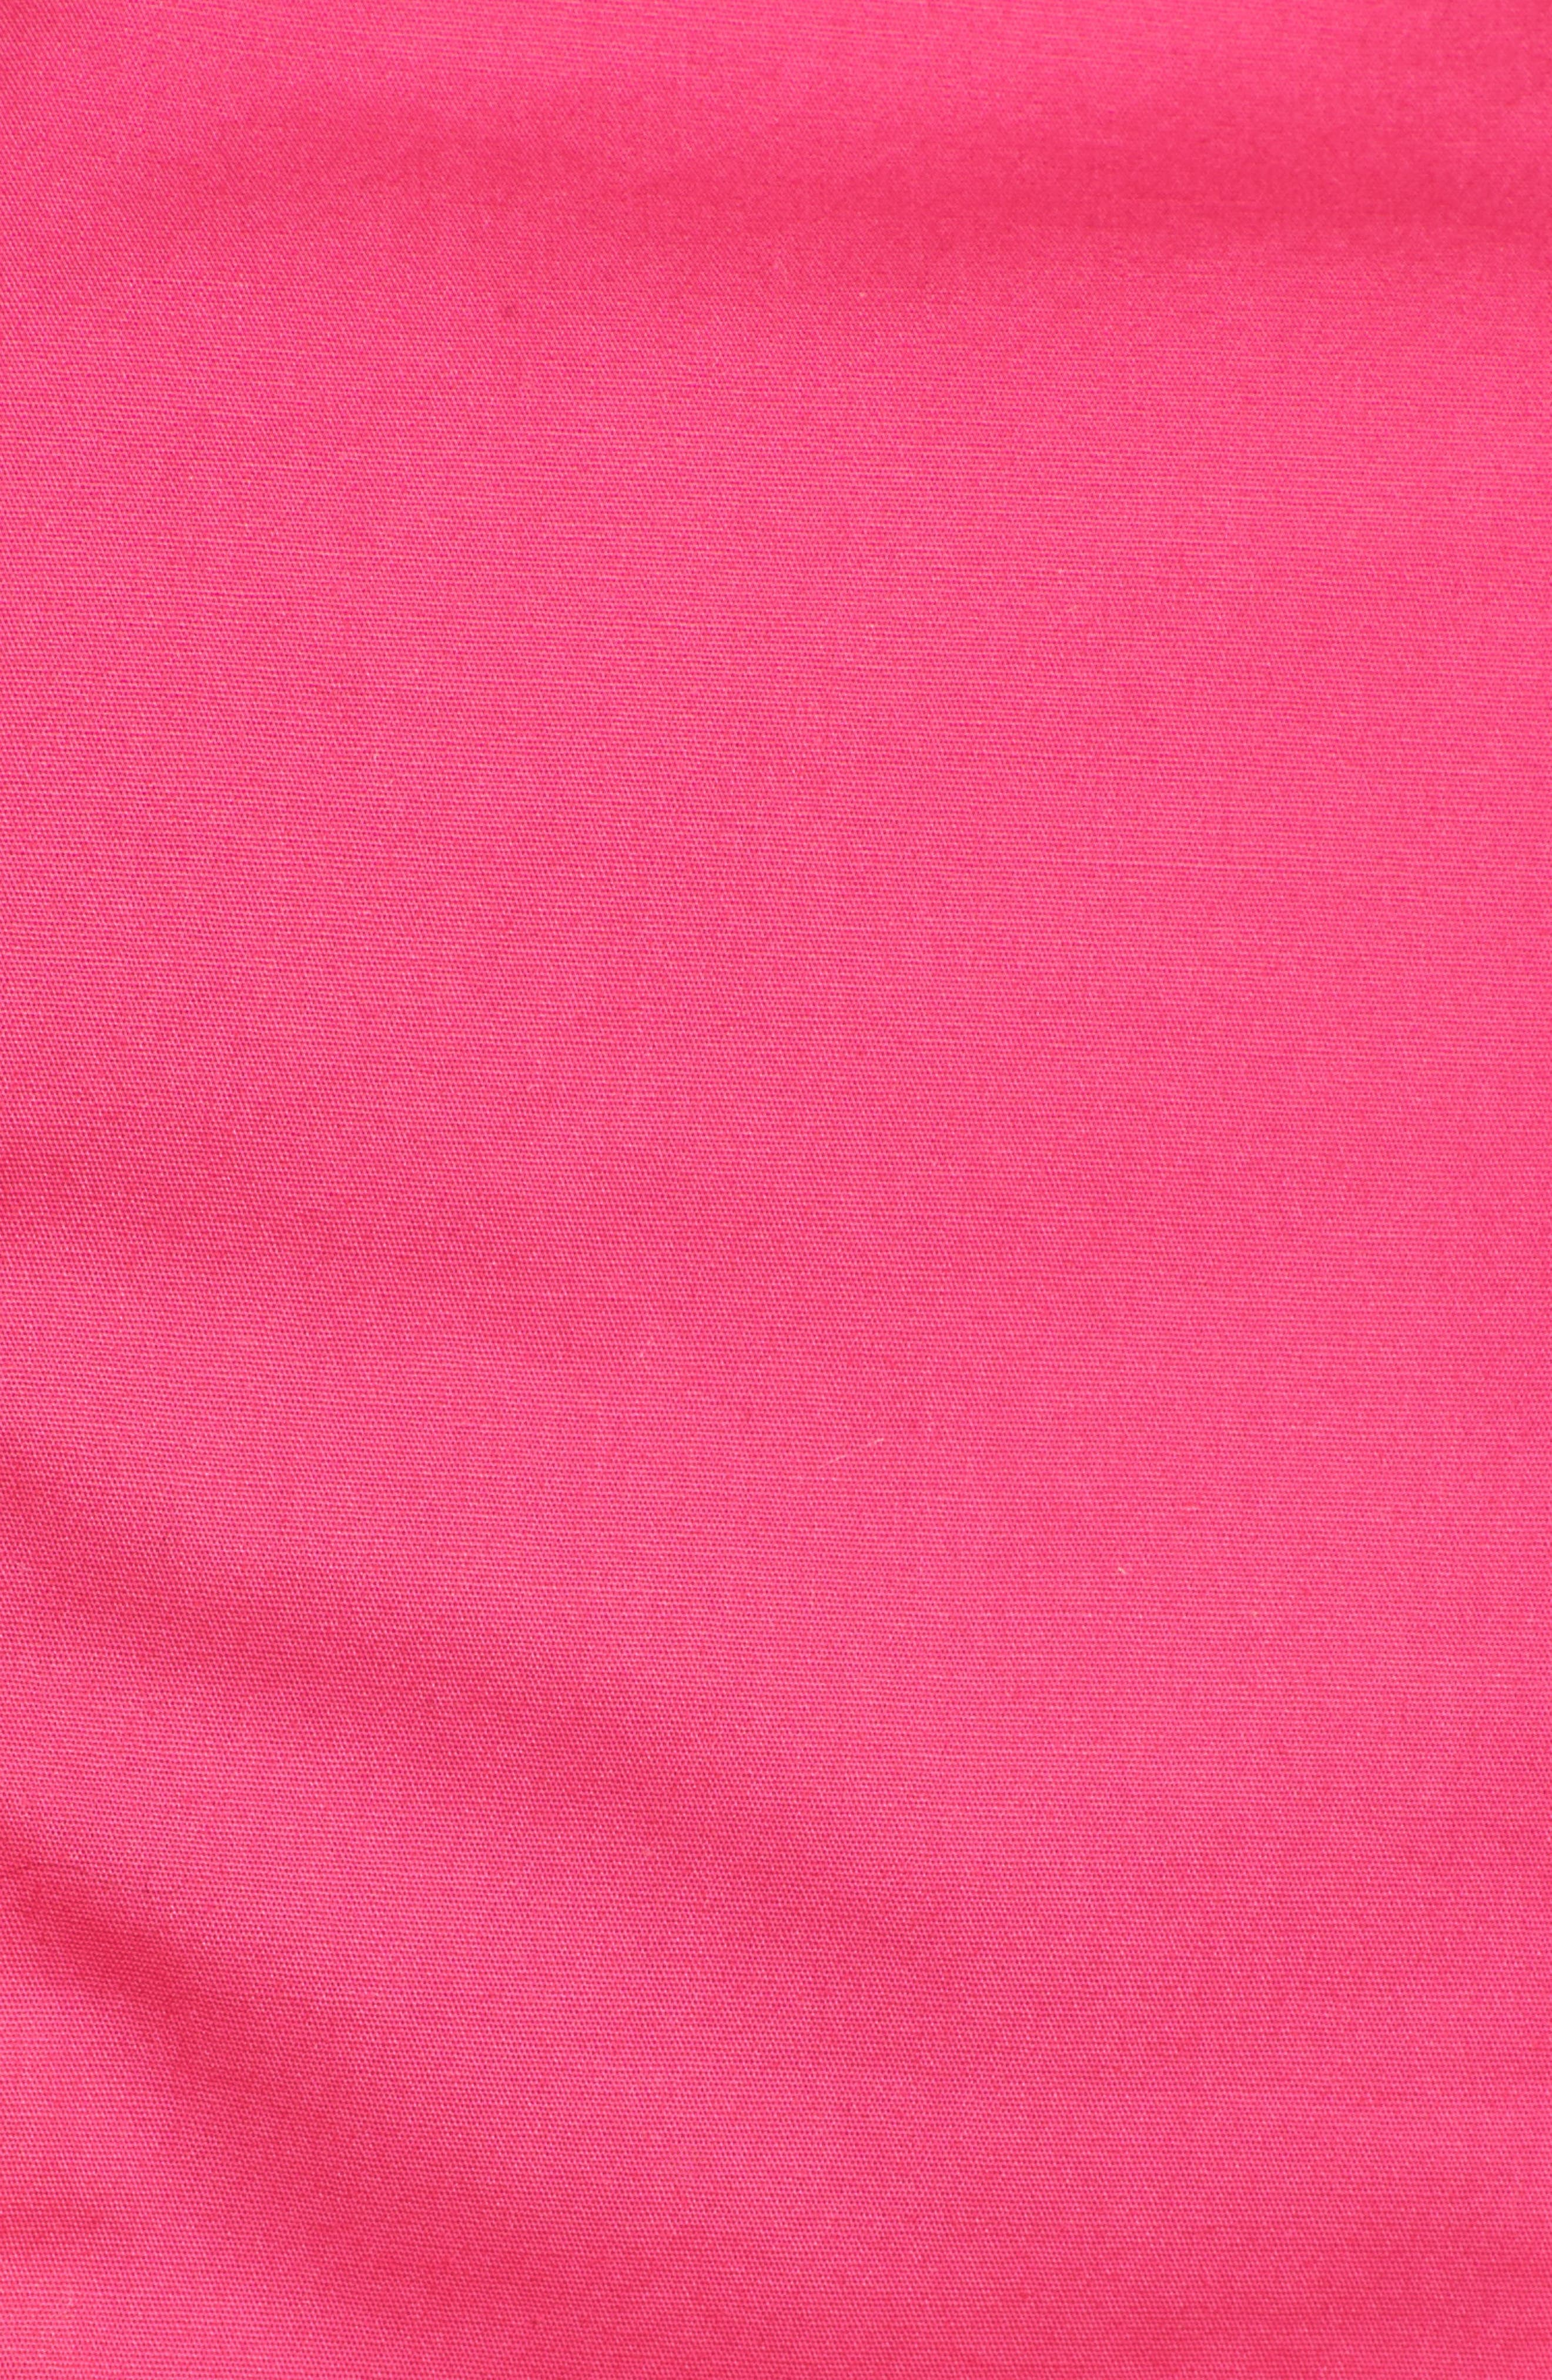 Ruffle Front Blouse,                             Alternate thumbnail 10, color,